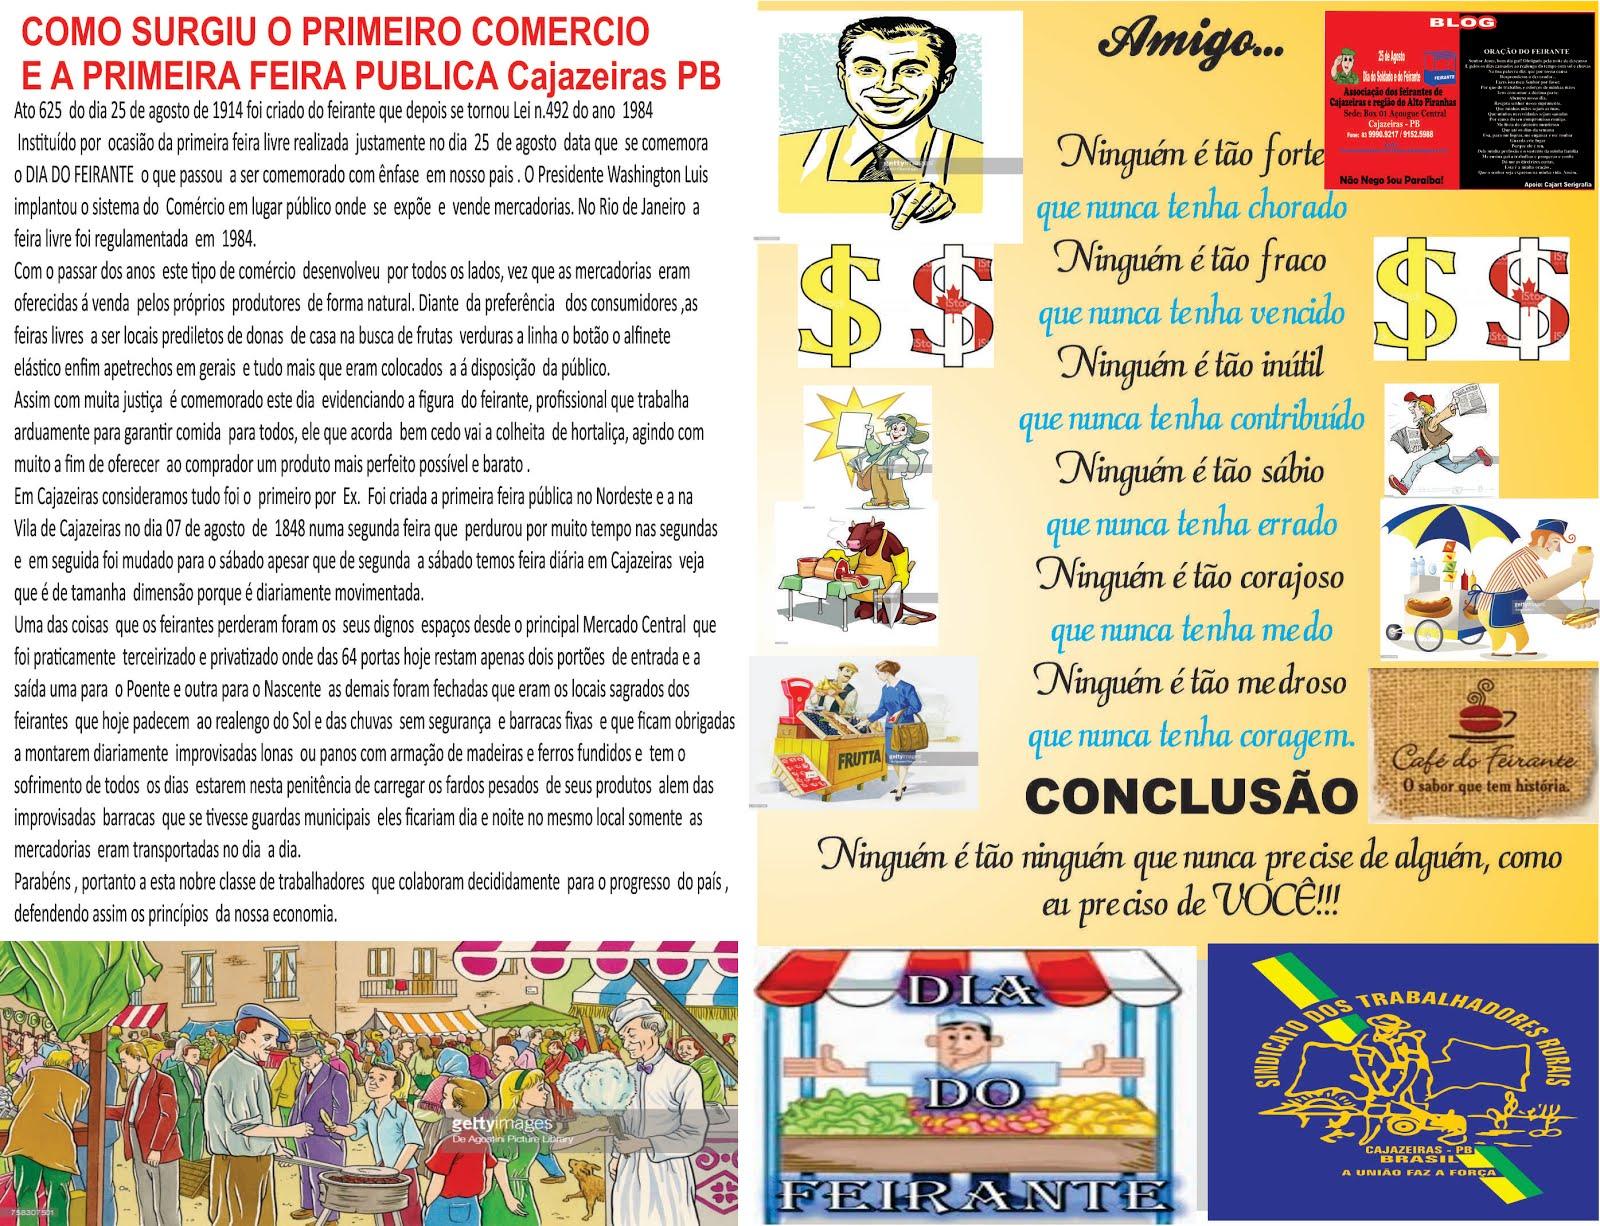 ATIVIDADES  DO SINDICATOS DOS FEIRANTES  DO ESTADO DA PARAIBA